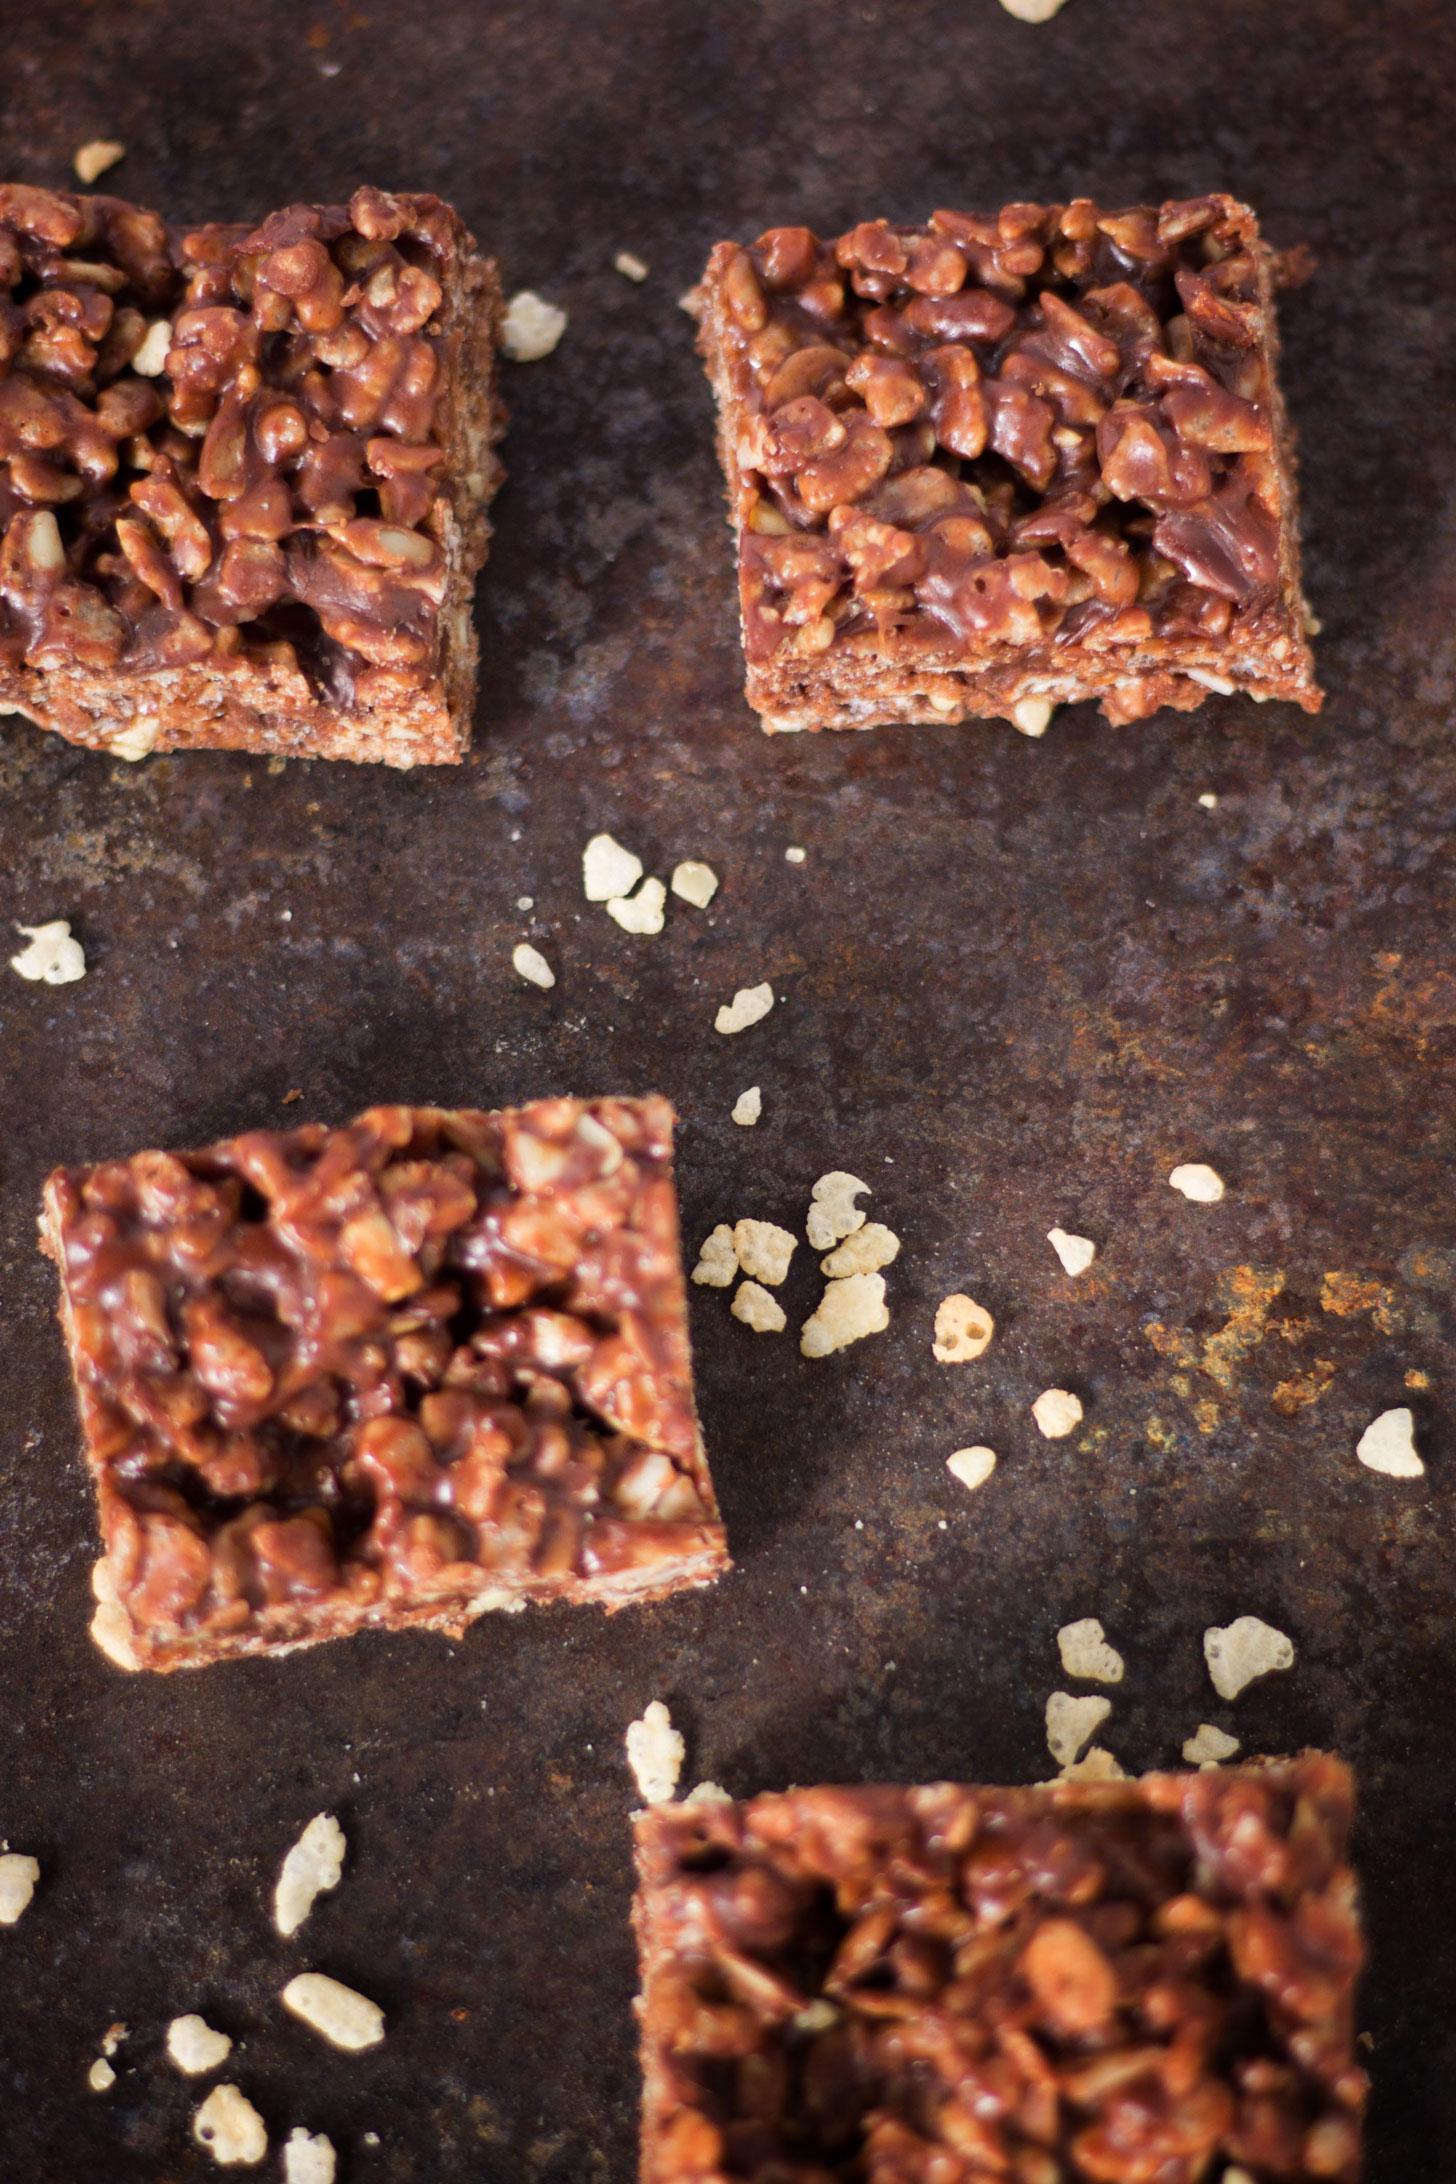 YUMMY Vegan Nutella Bars! Perfect dessert bar! Chocolate and hazelnut rice krispy treat. #vegan #glutenfree #plantbased #ricekrispytreat #recipe